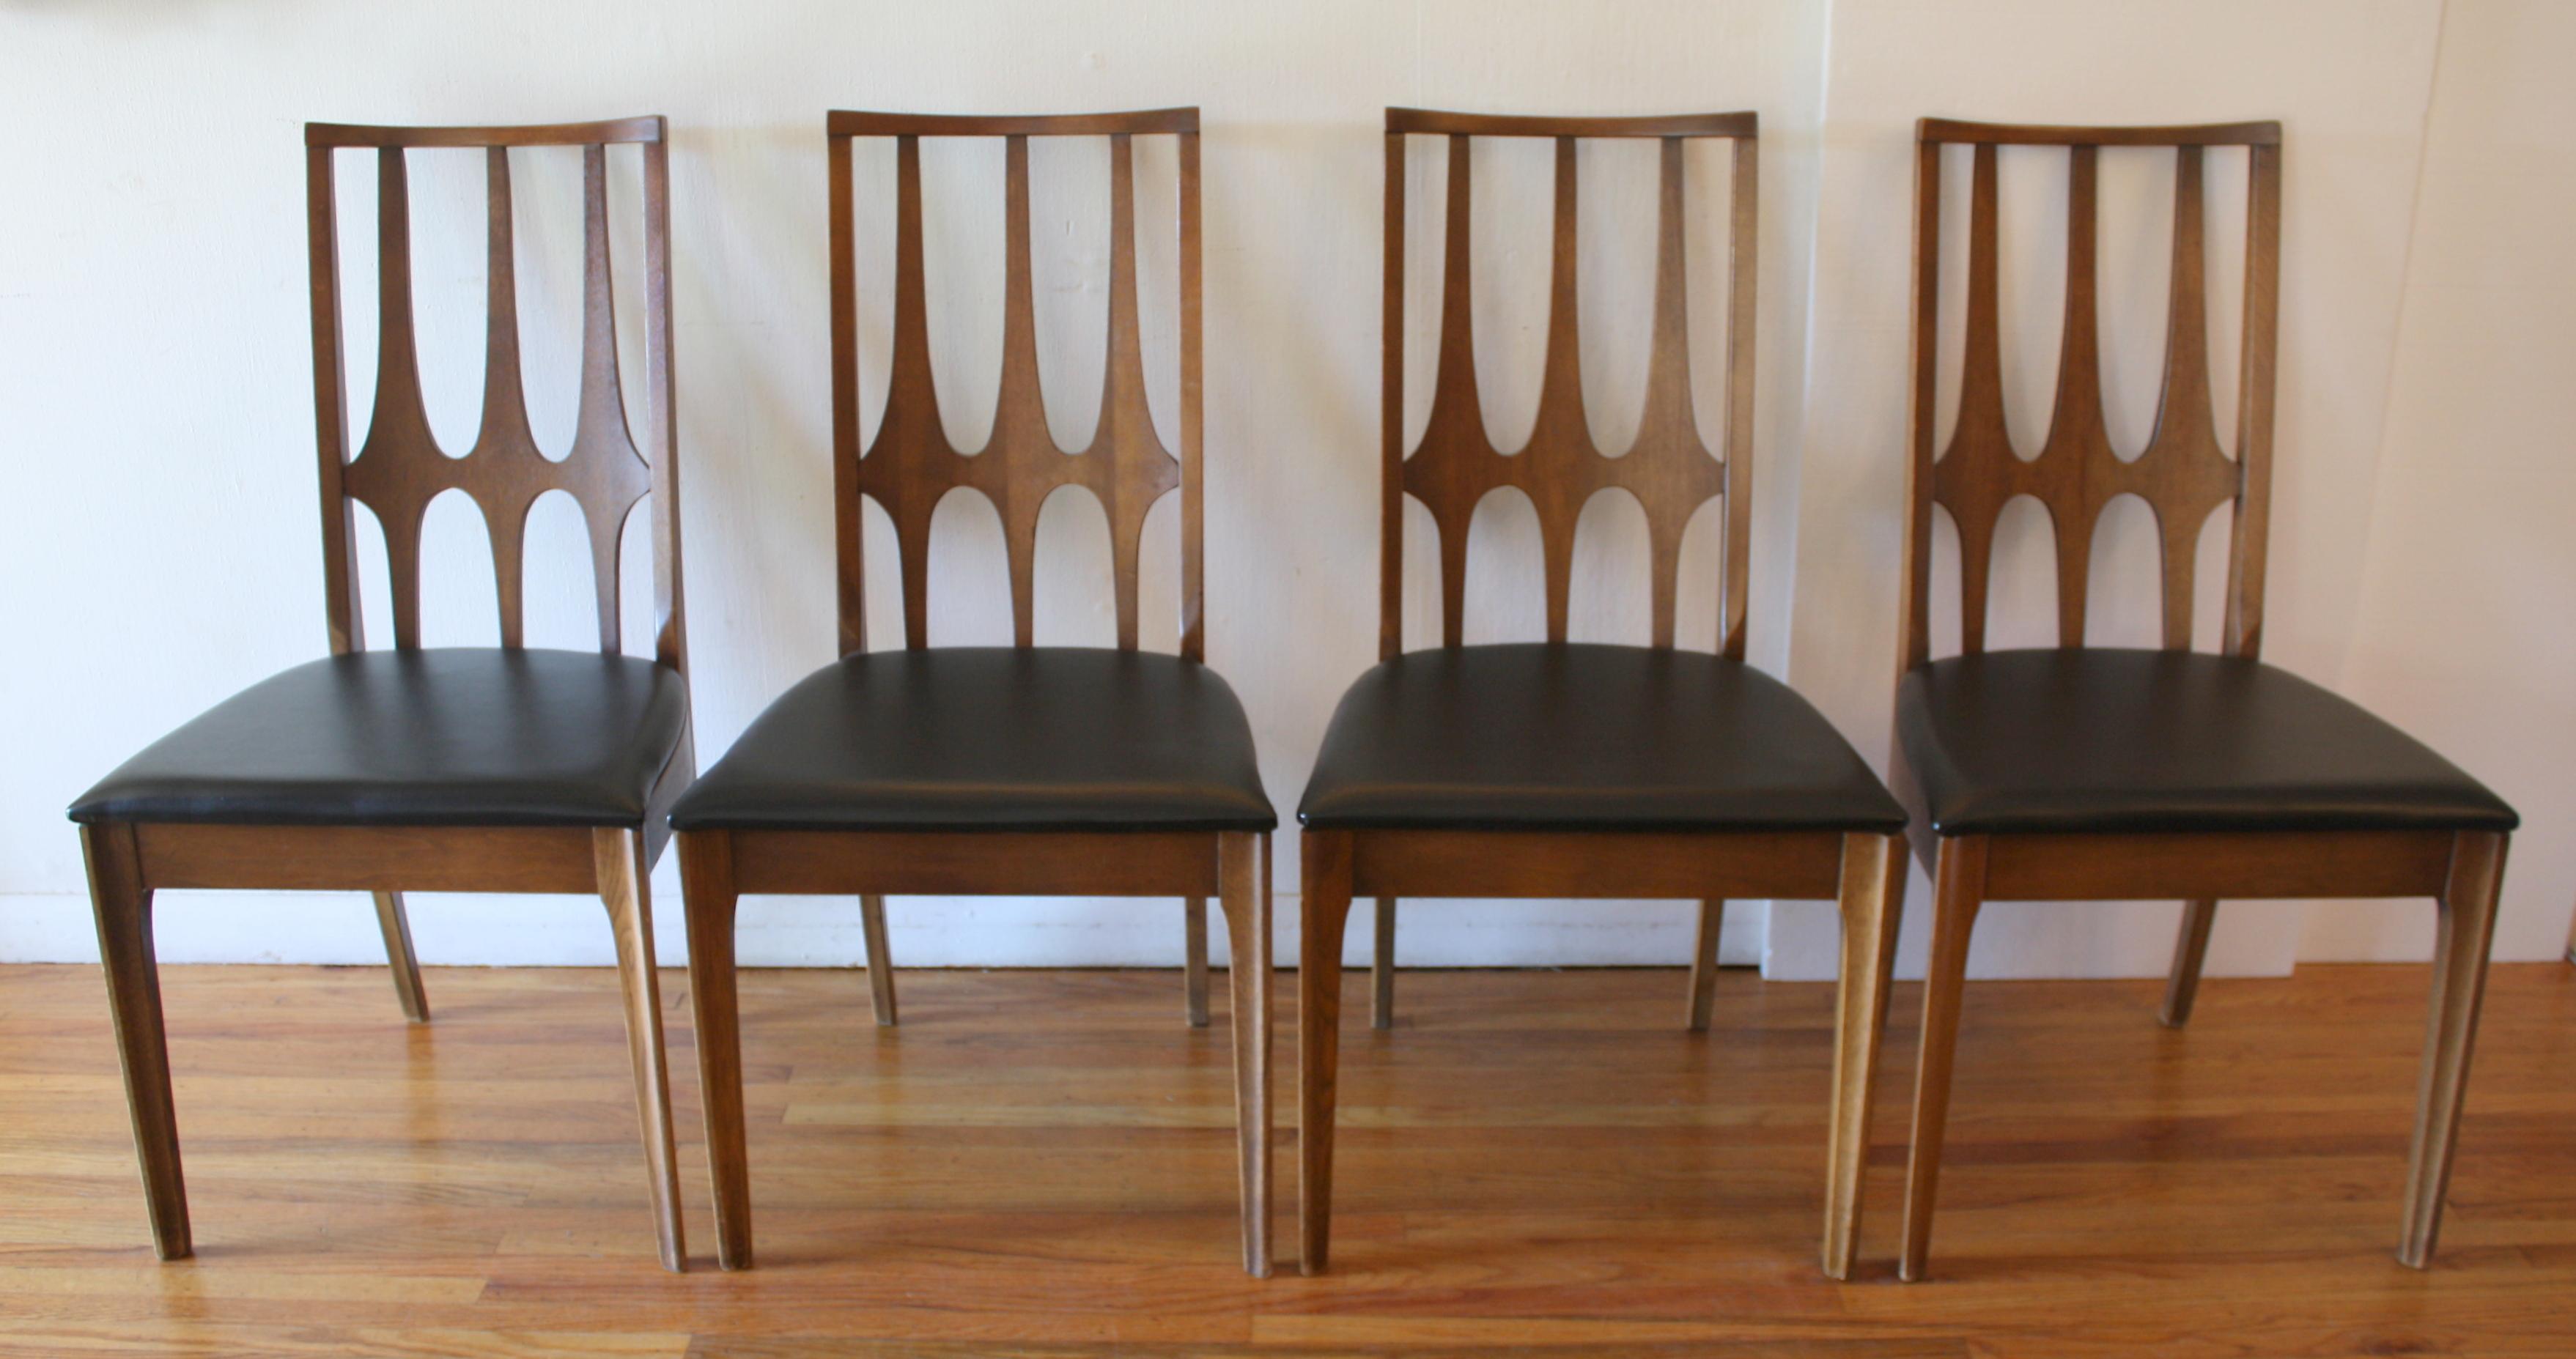 Brasilia chairs.JPG